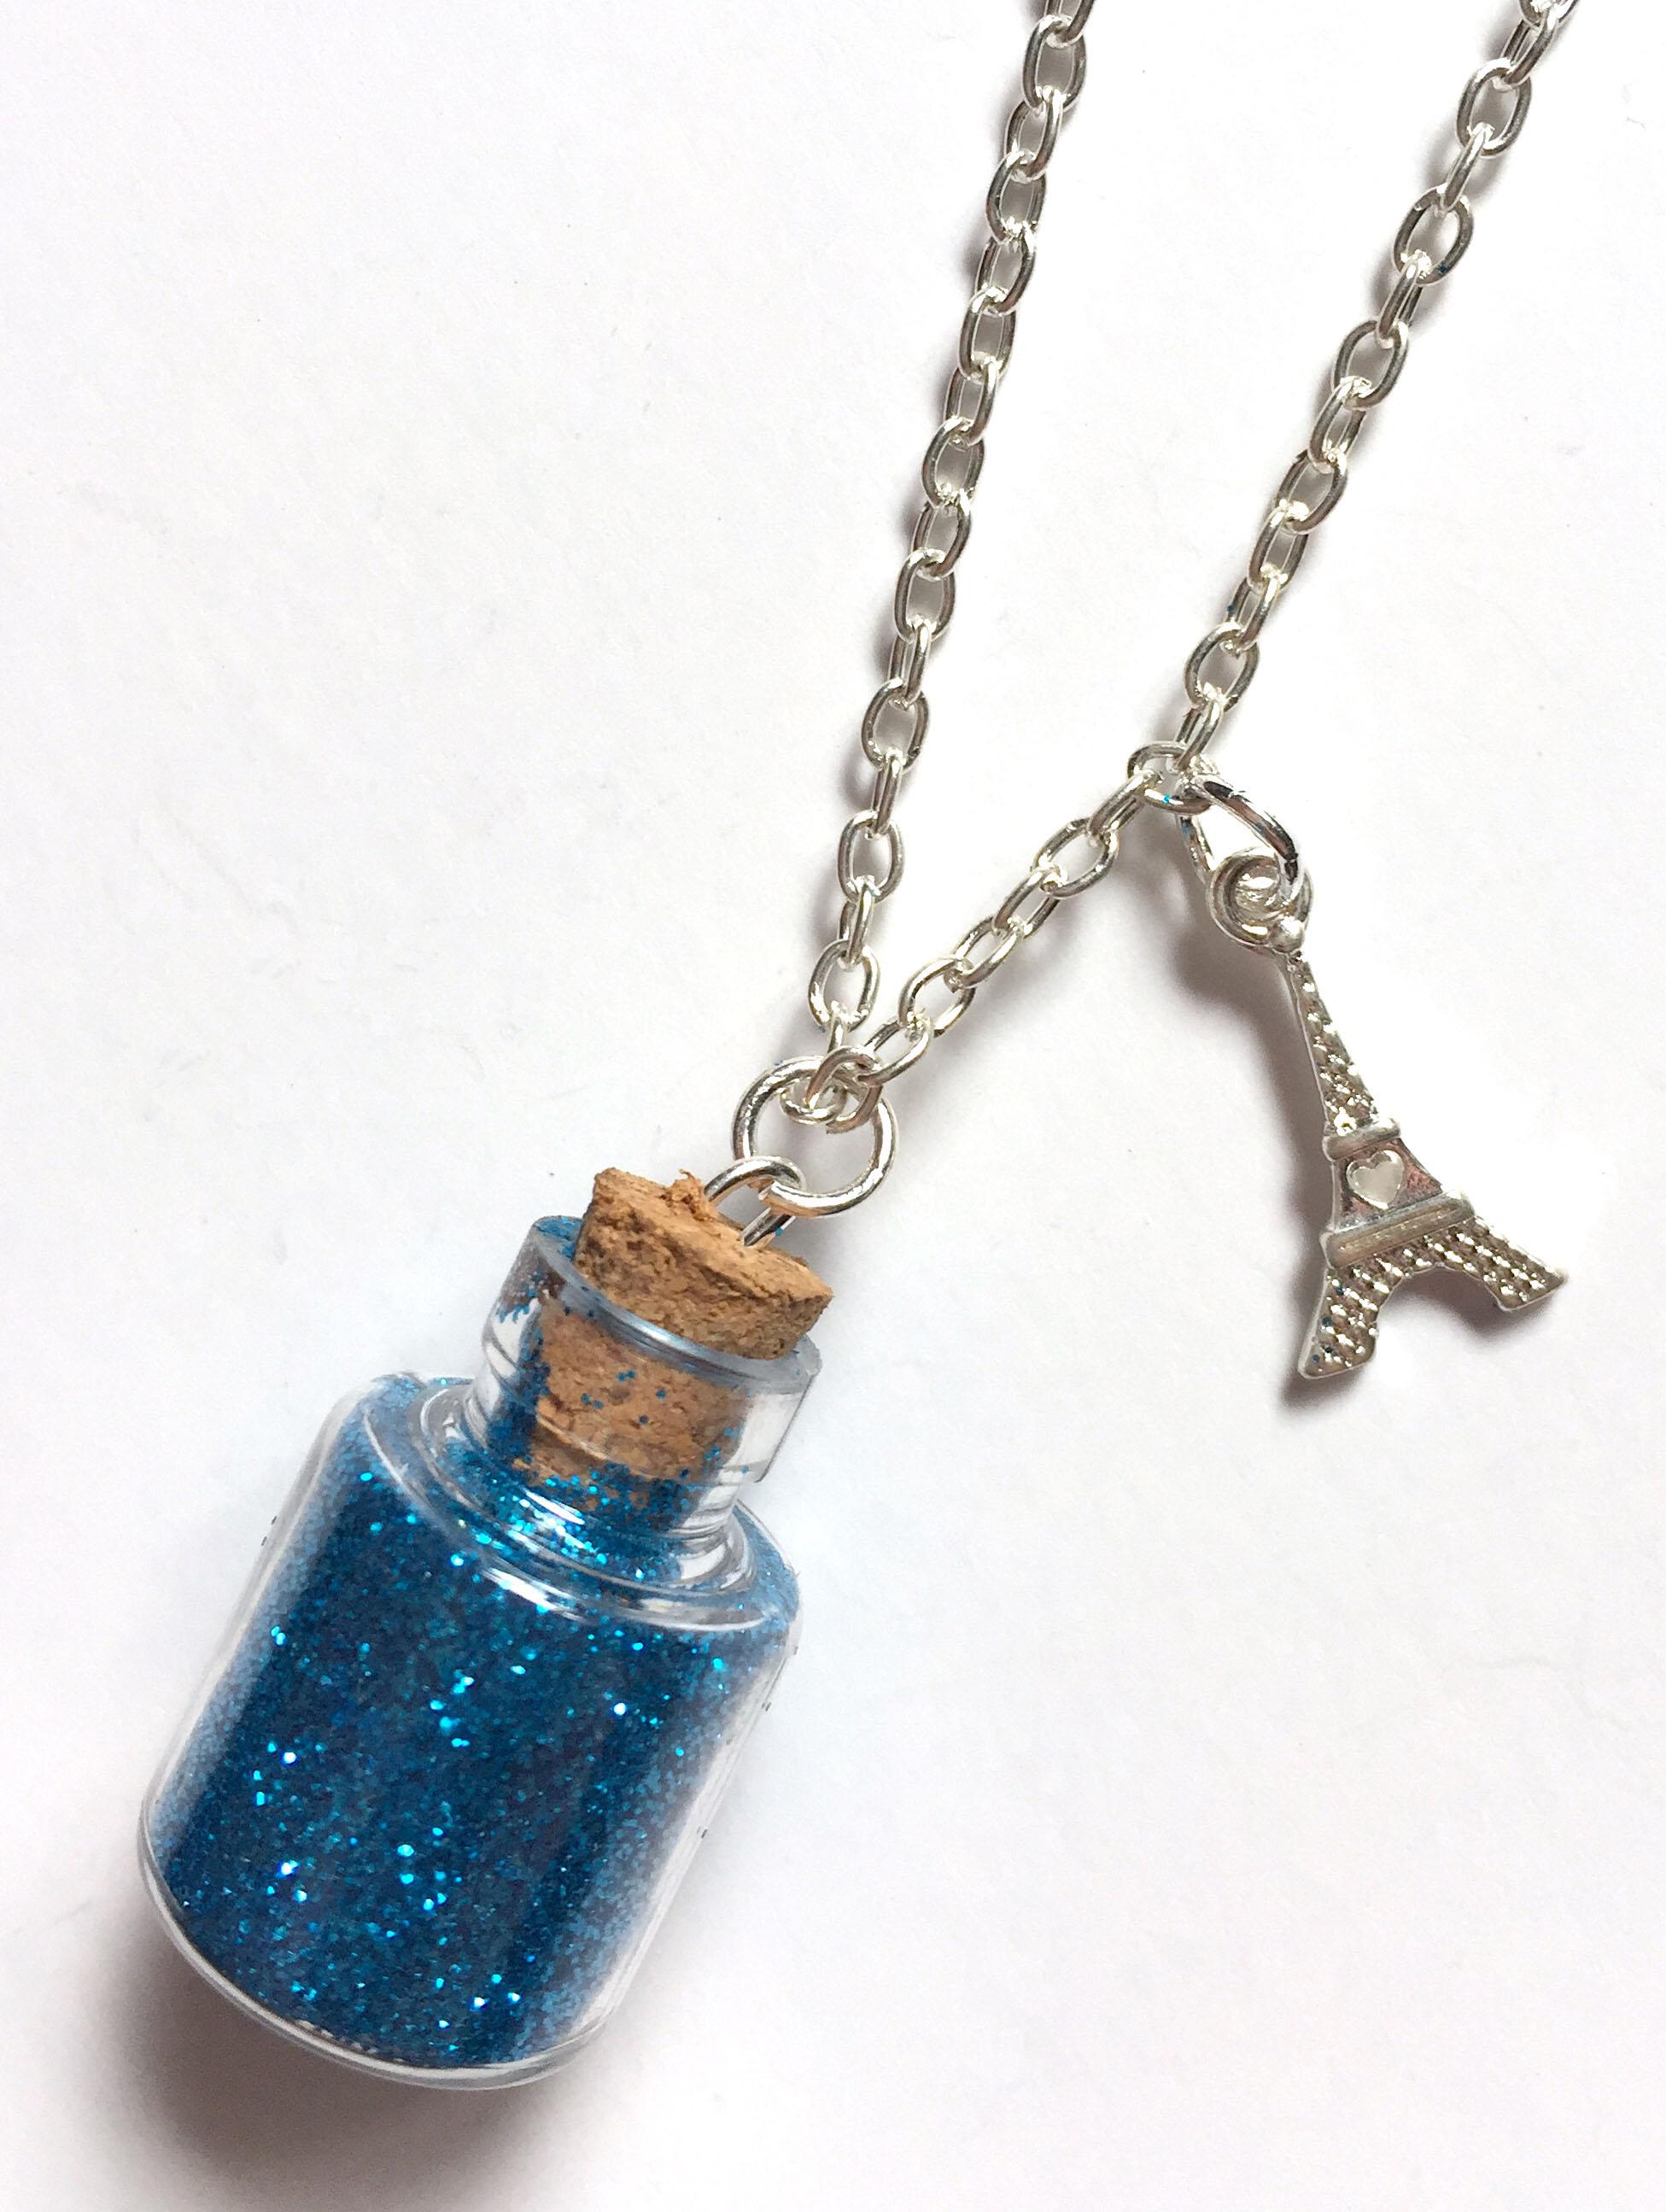 Eiffel Tower Bottle Necklace